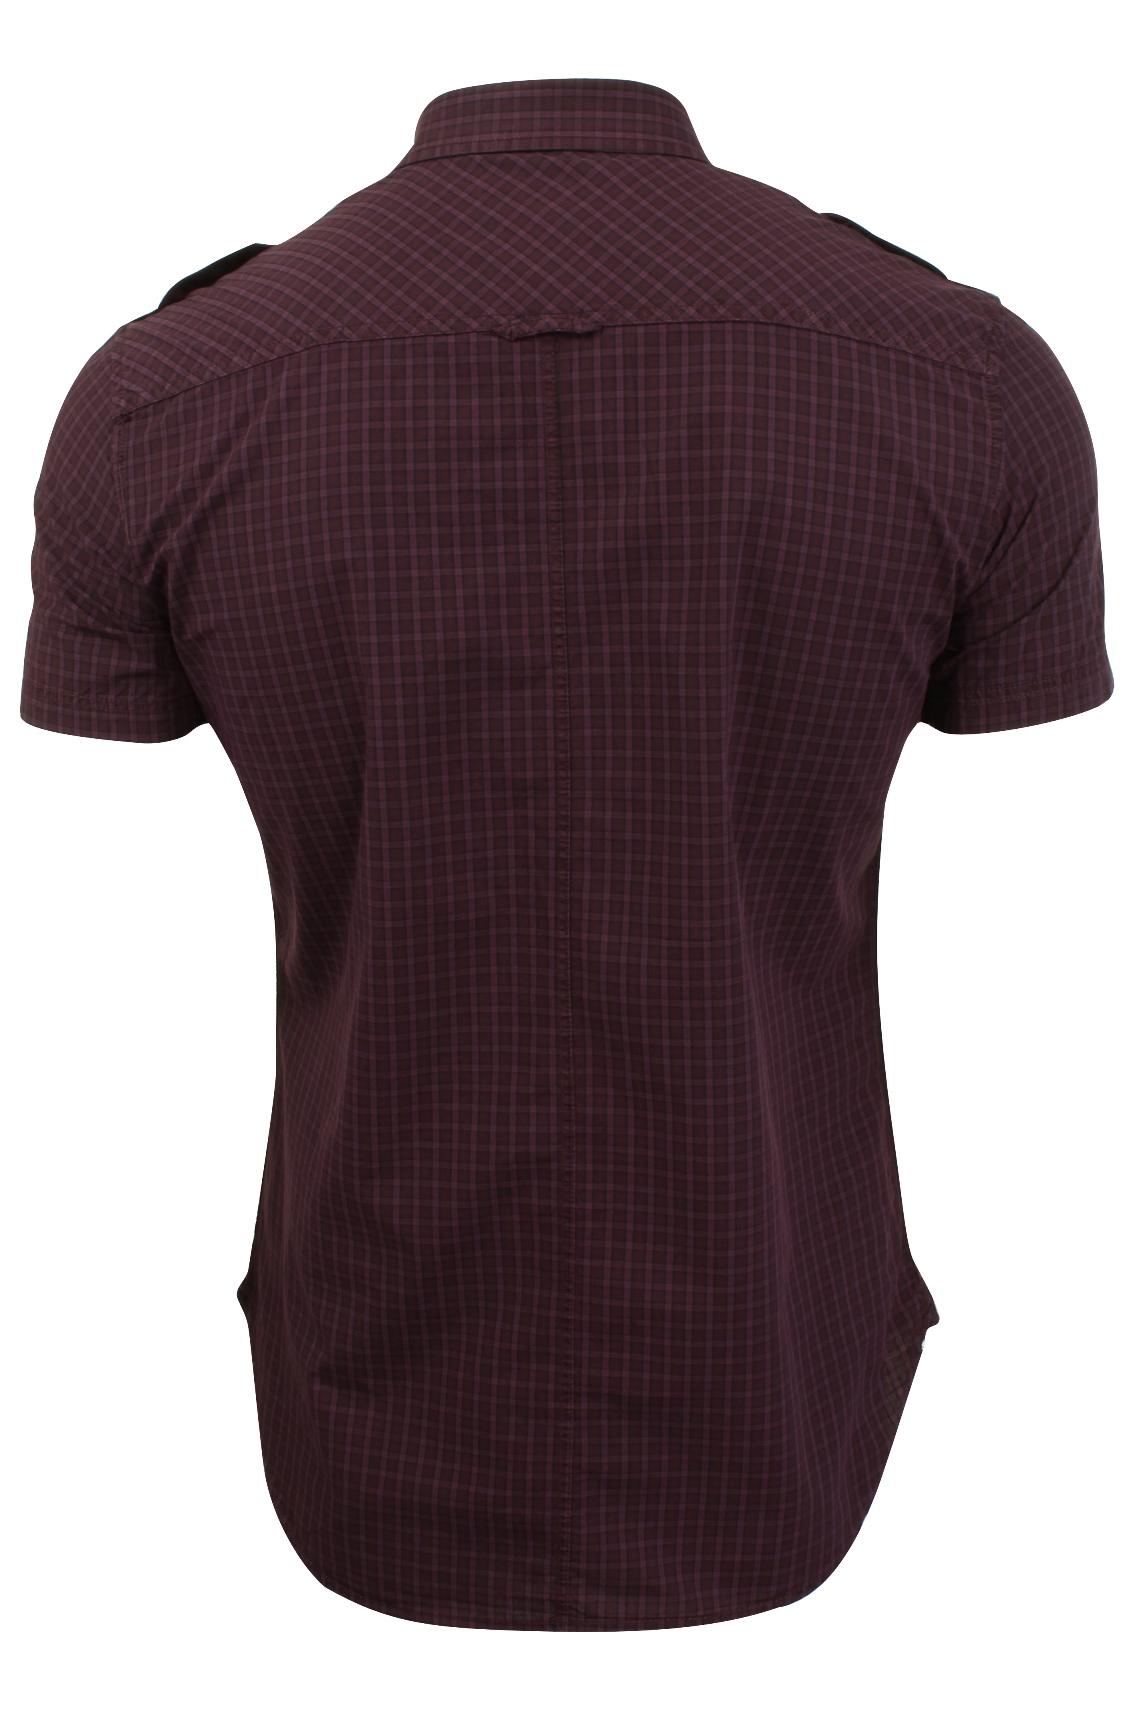 Mens-Short-Sleeved-Shirt-by-Firetrap thumbnail 23